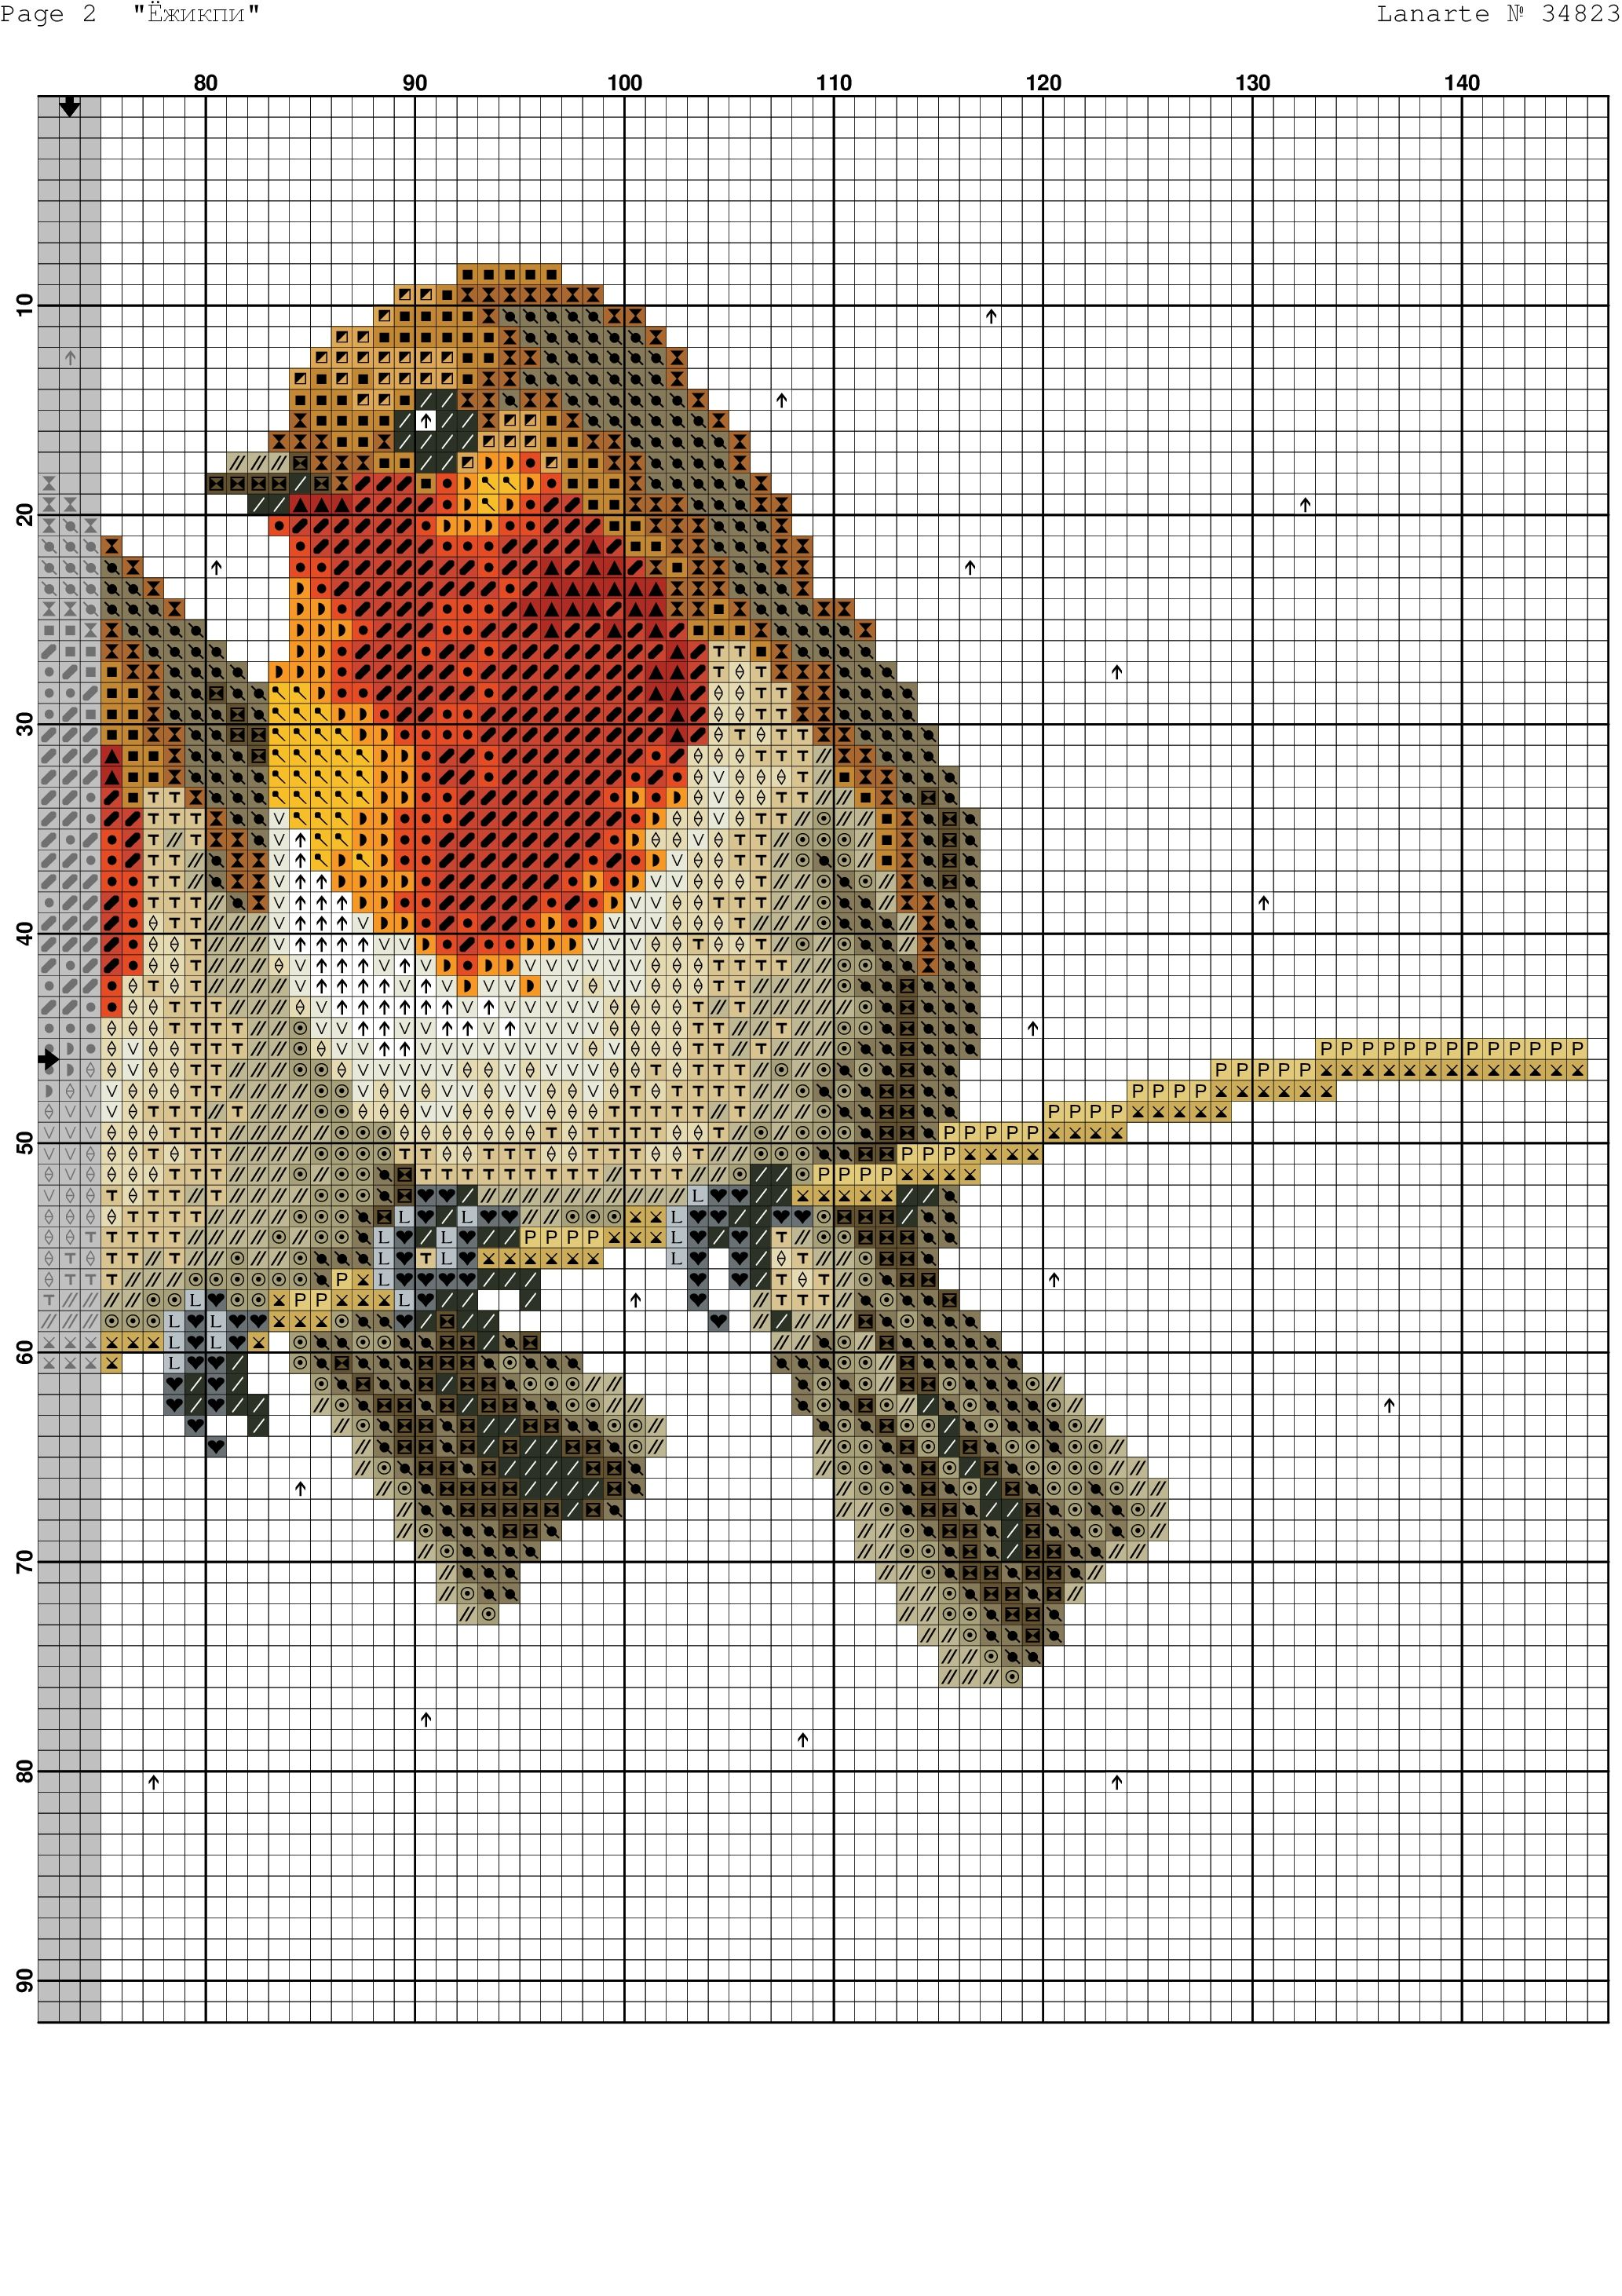 Tres pájaros. Punto de cruz. | pajaritos punto cruz | Pinterest ...